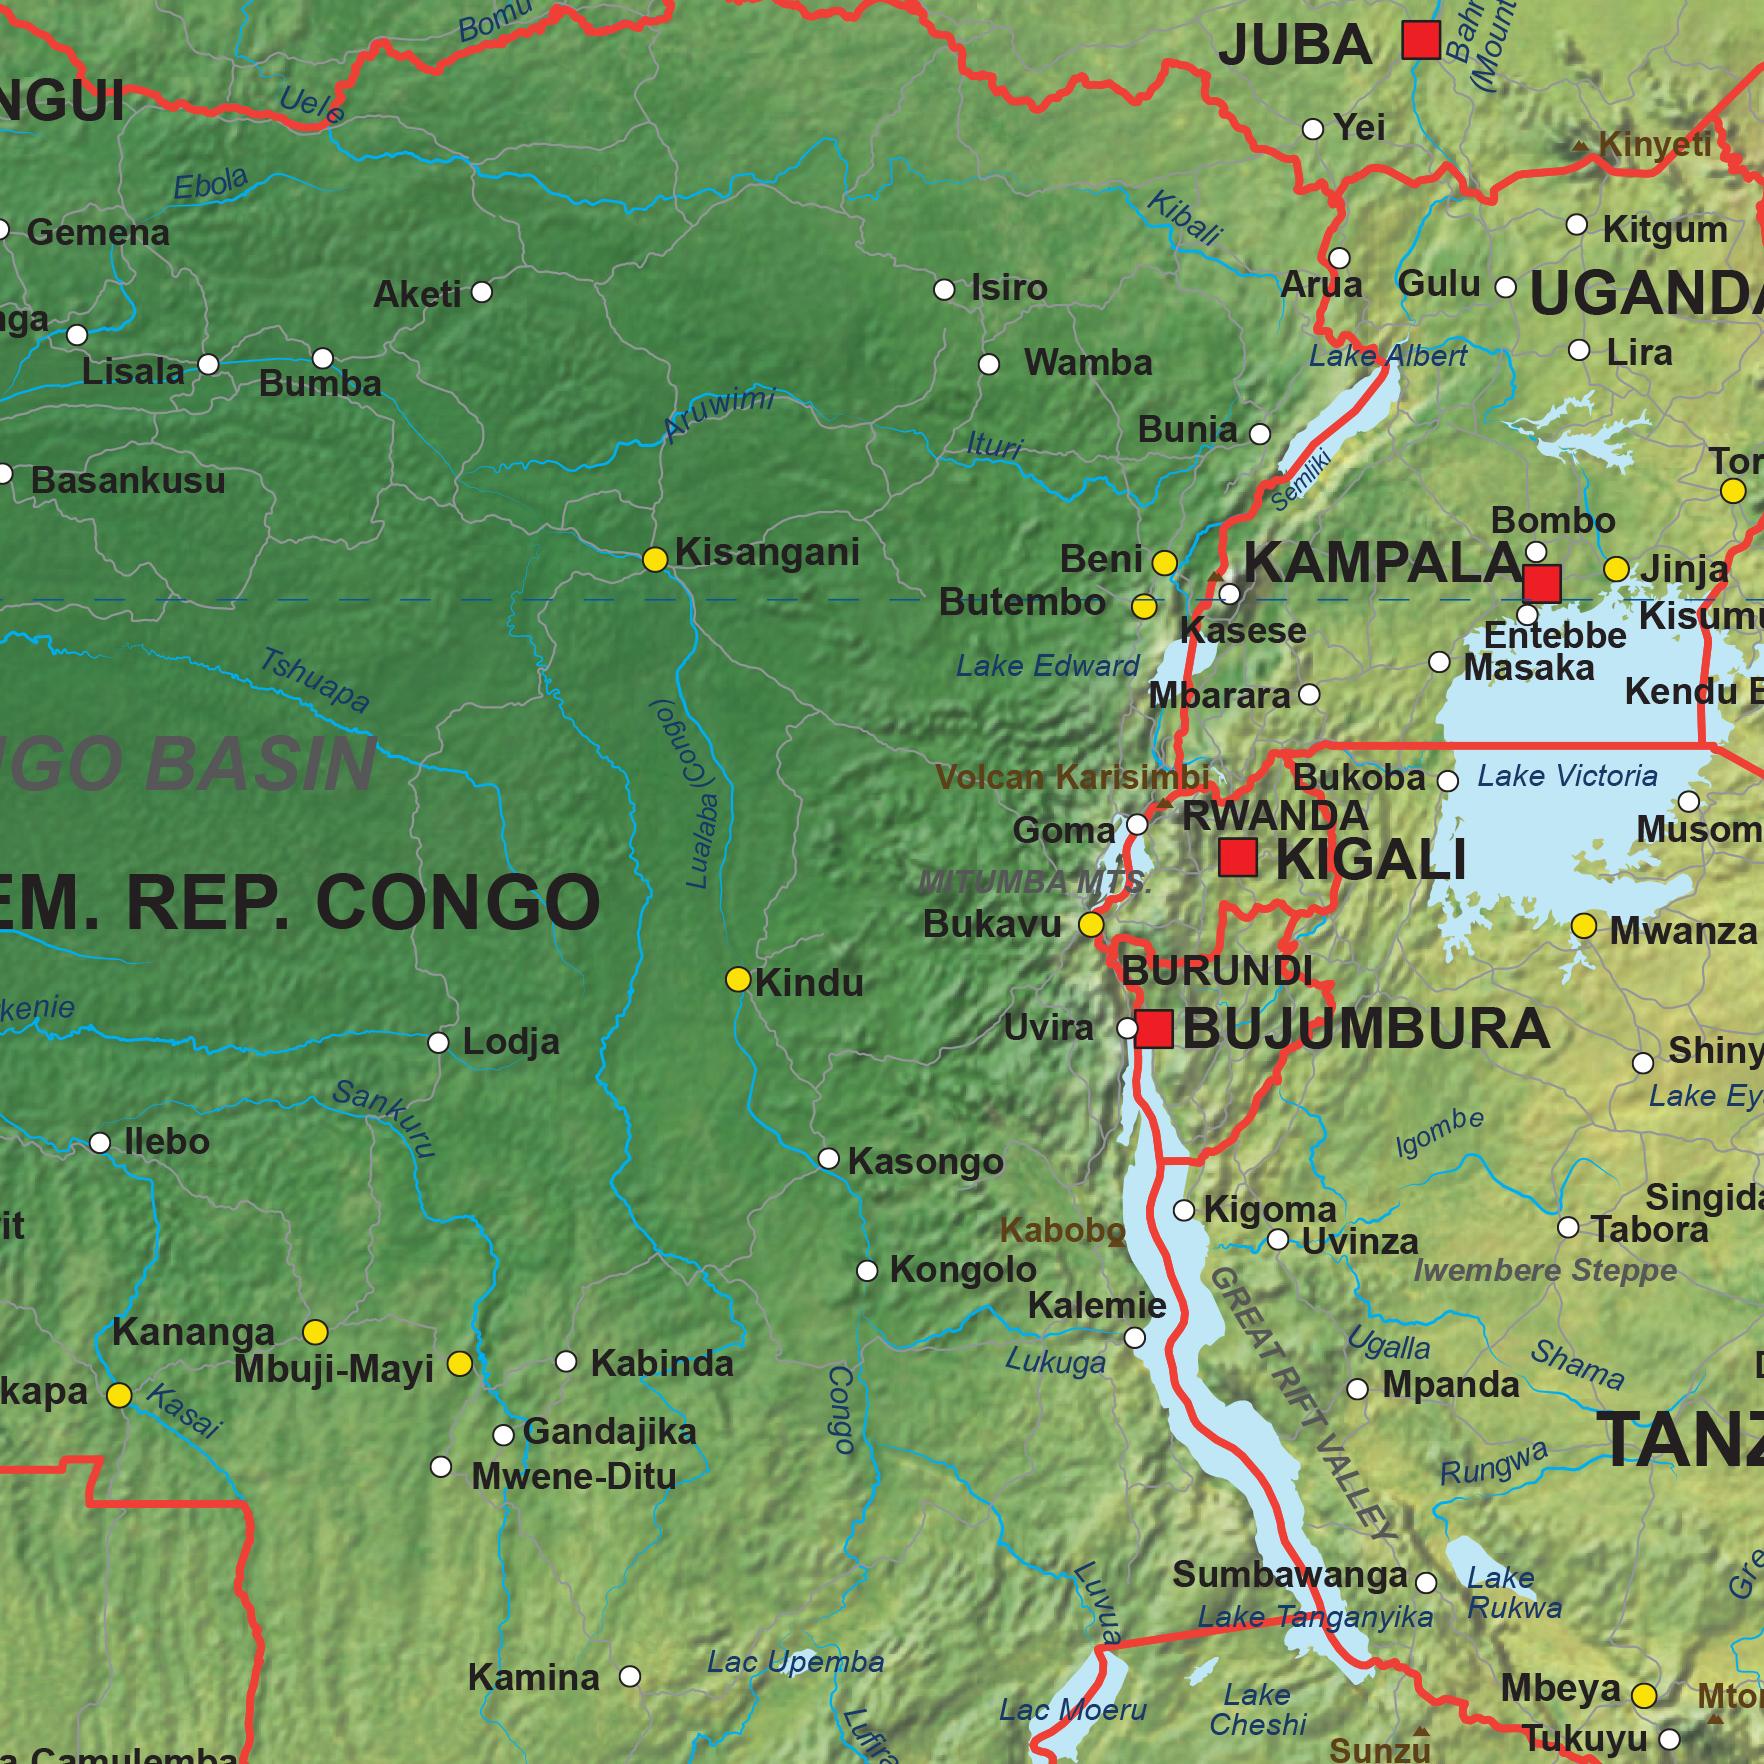 Digital Physical Map Africa 1288 The World of Mapscom